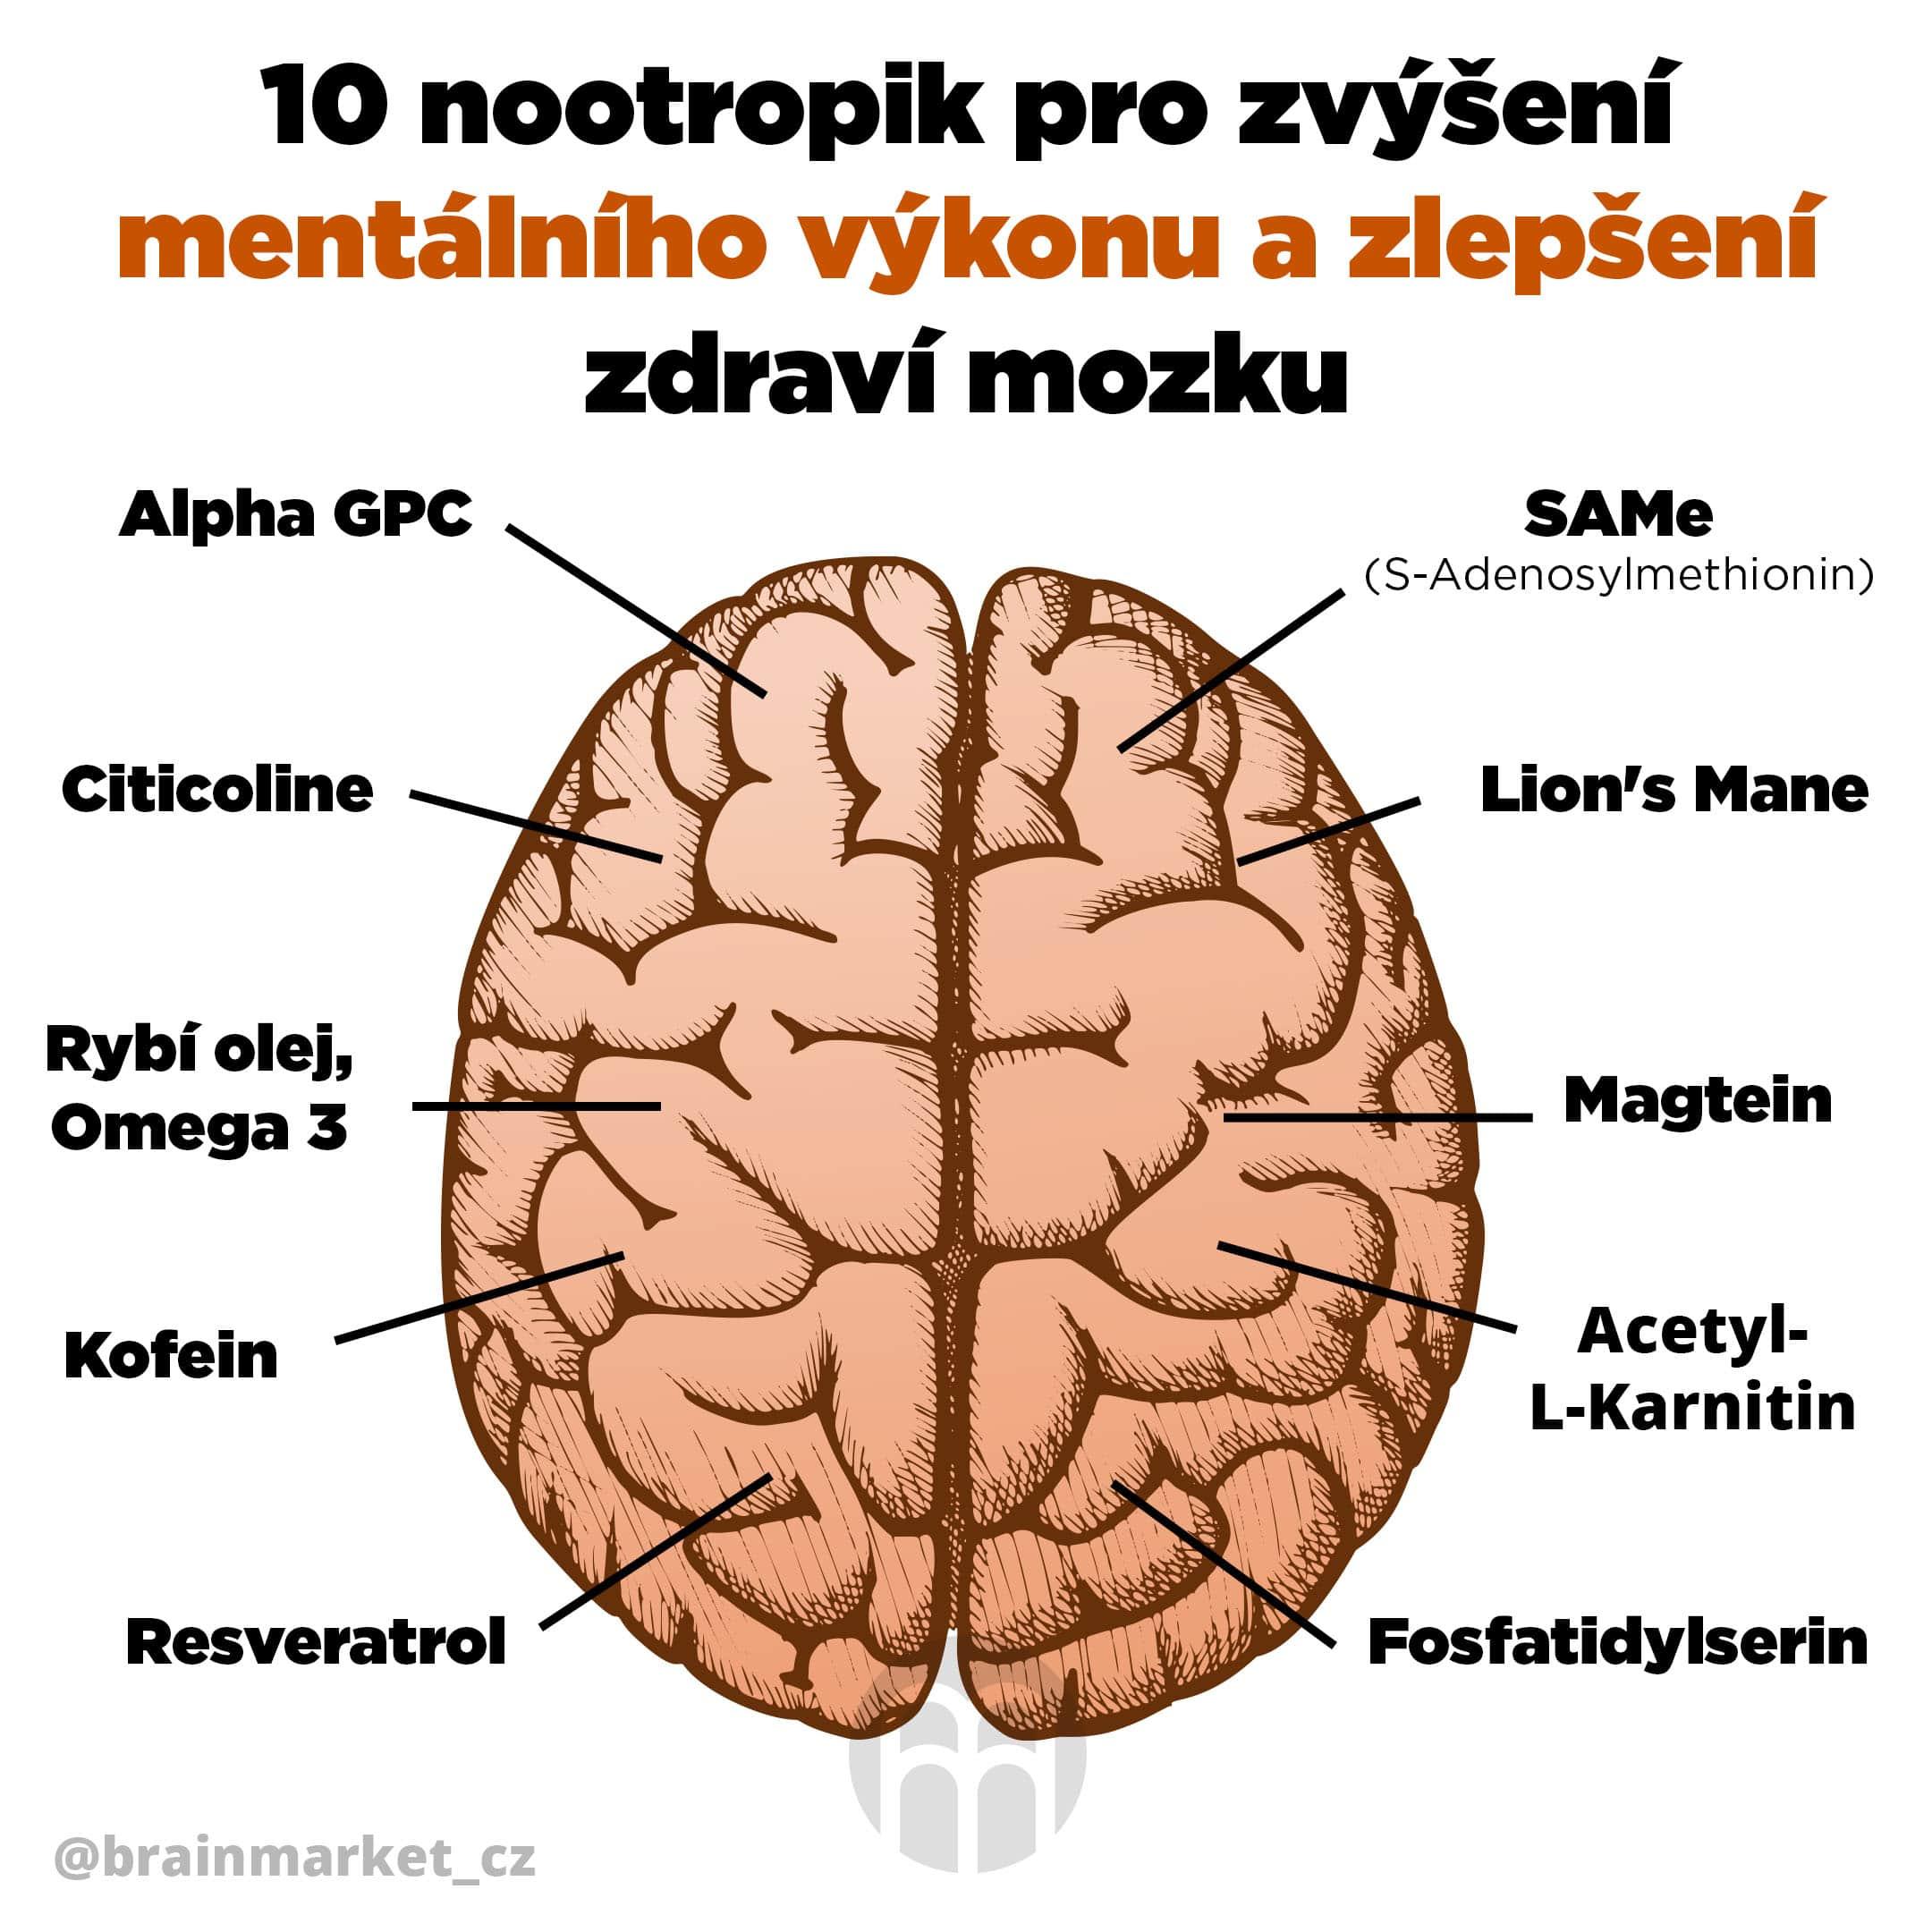 10_nootrpik_pro_zvyseni_mentalniho_vykonu-min